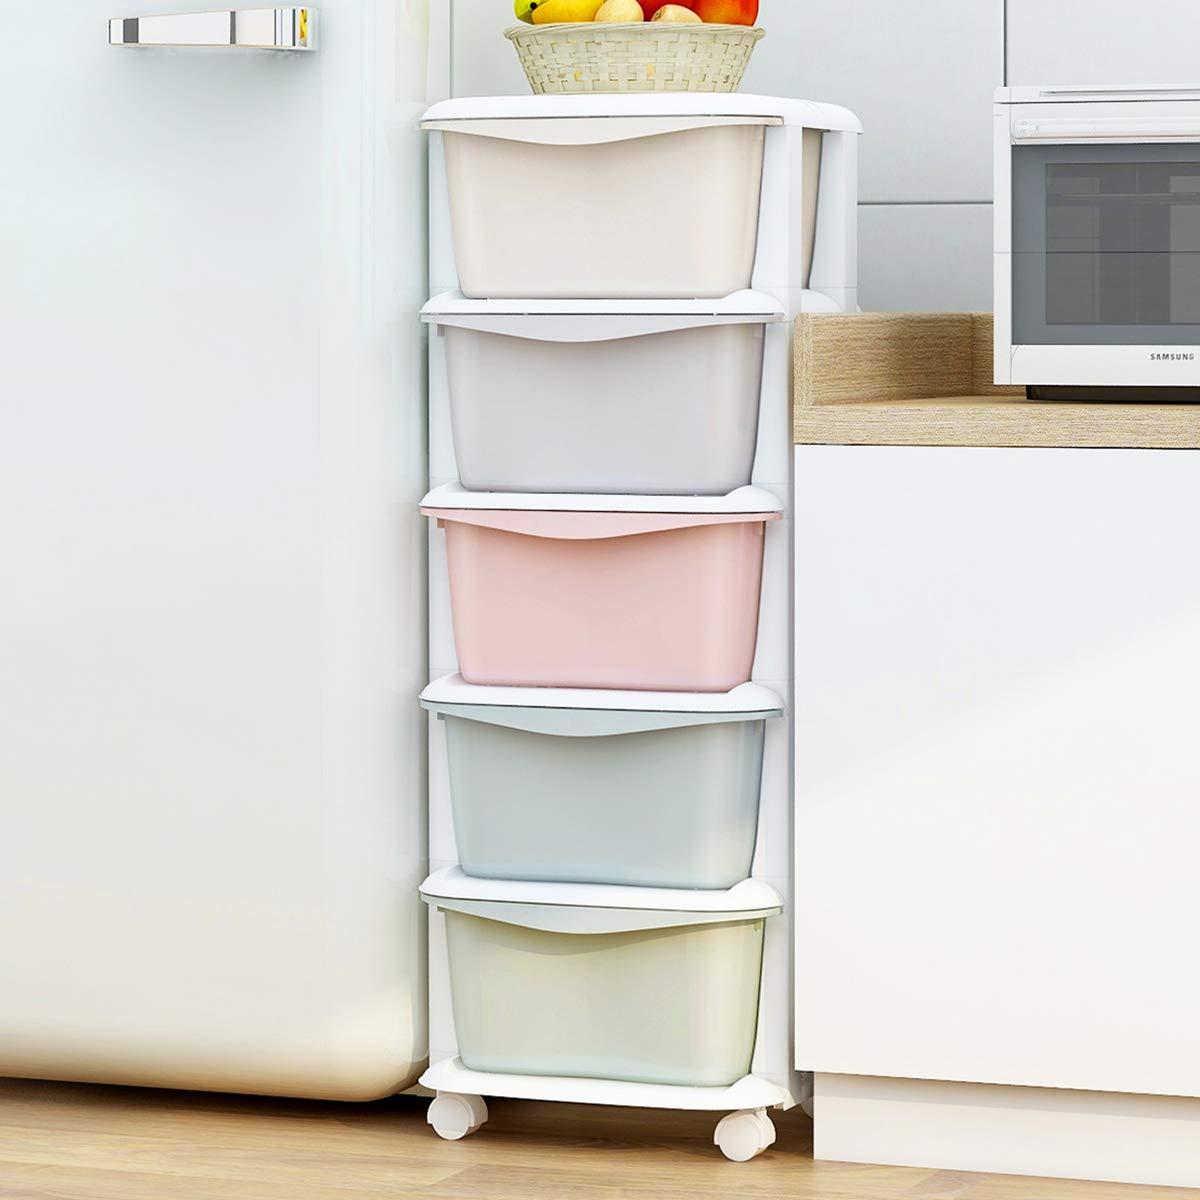 Nafenai Baby Storage Organizer, Cute Multicolor Drawer Storage Cart for Kids Bedroom, 5 Drawers-14.57'' L x 14.96'' W x 38.19'' H by Nafenai (Image #1)